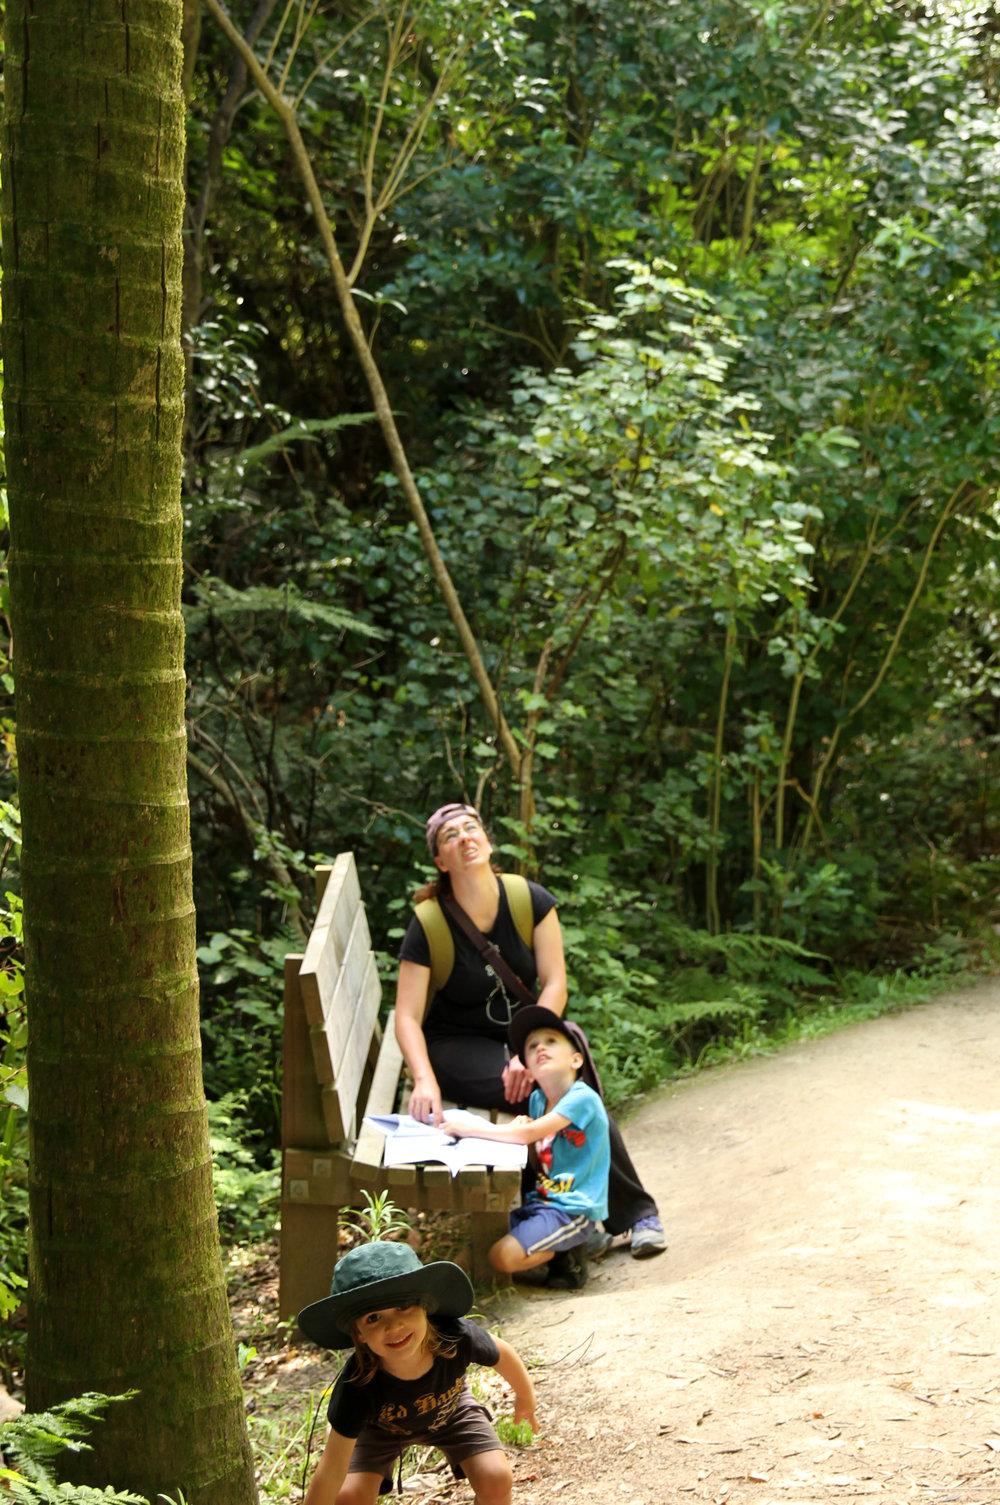 Completing the Nikau tree kiwi ranger activity.